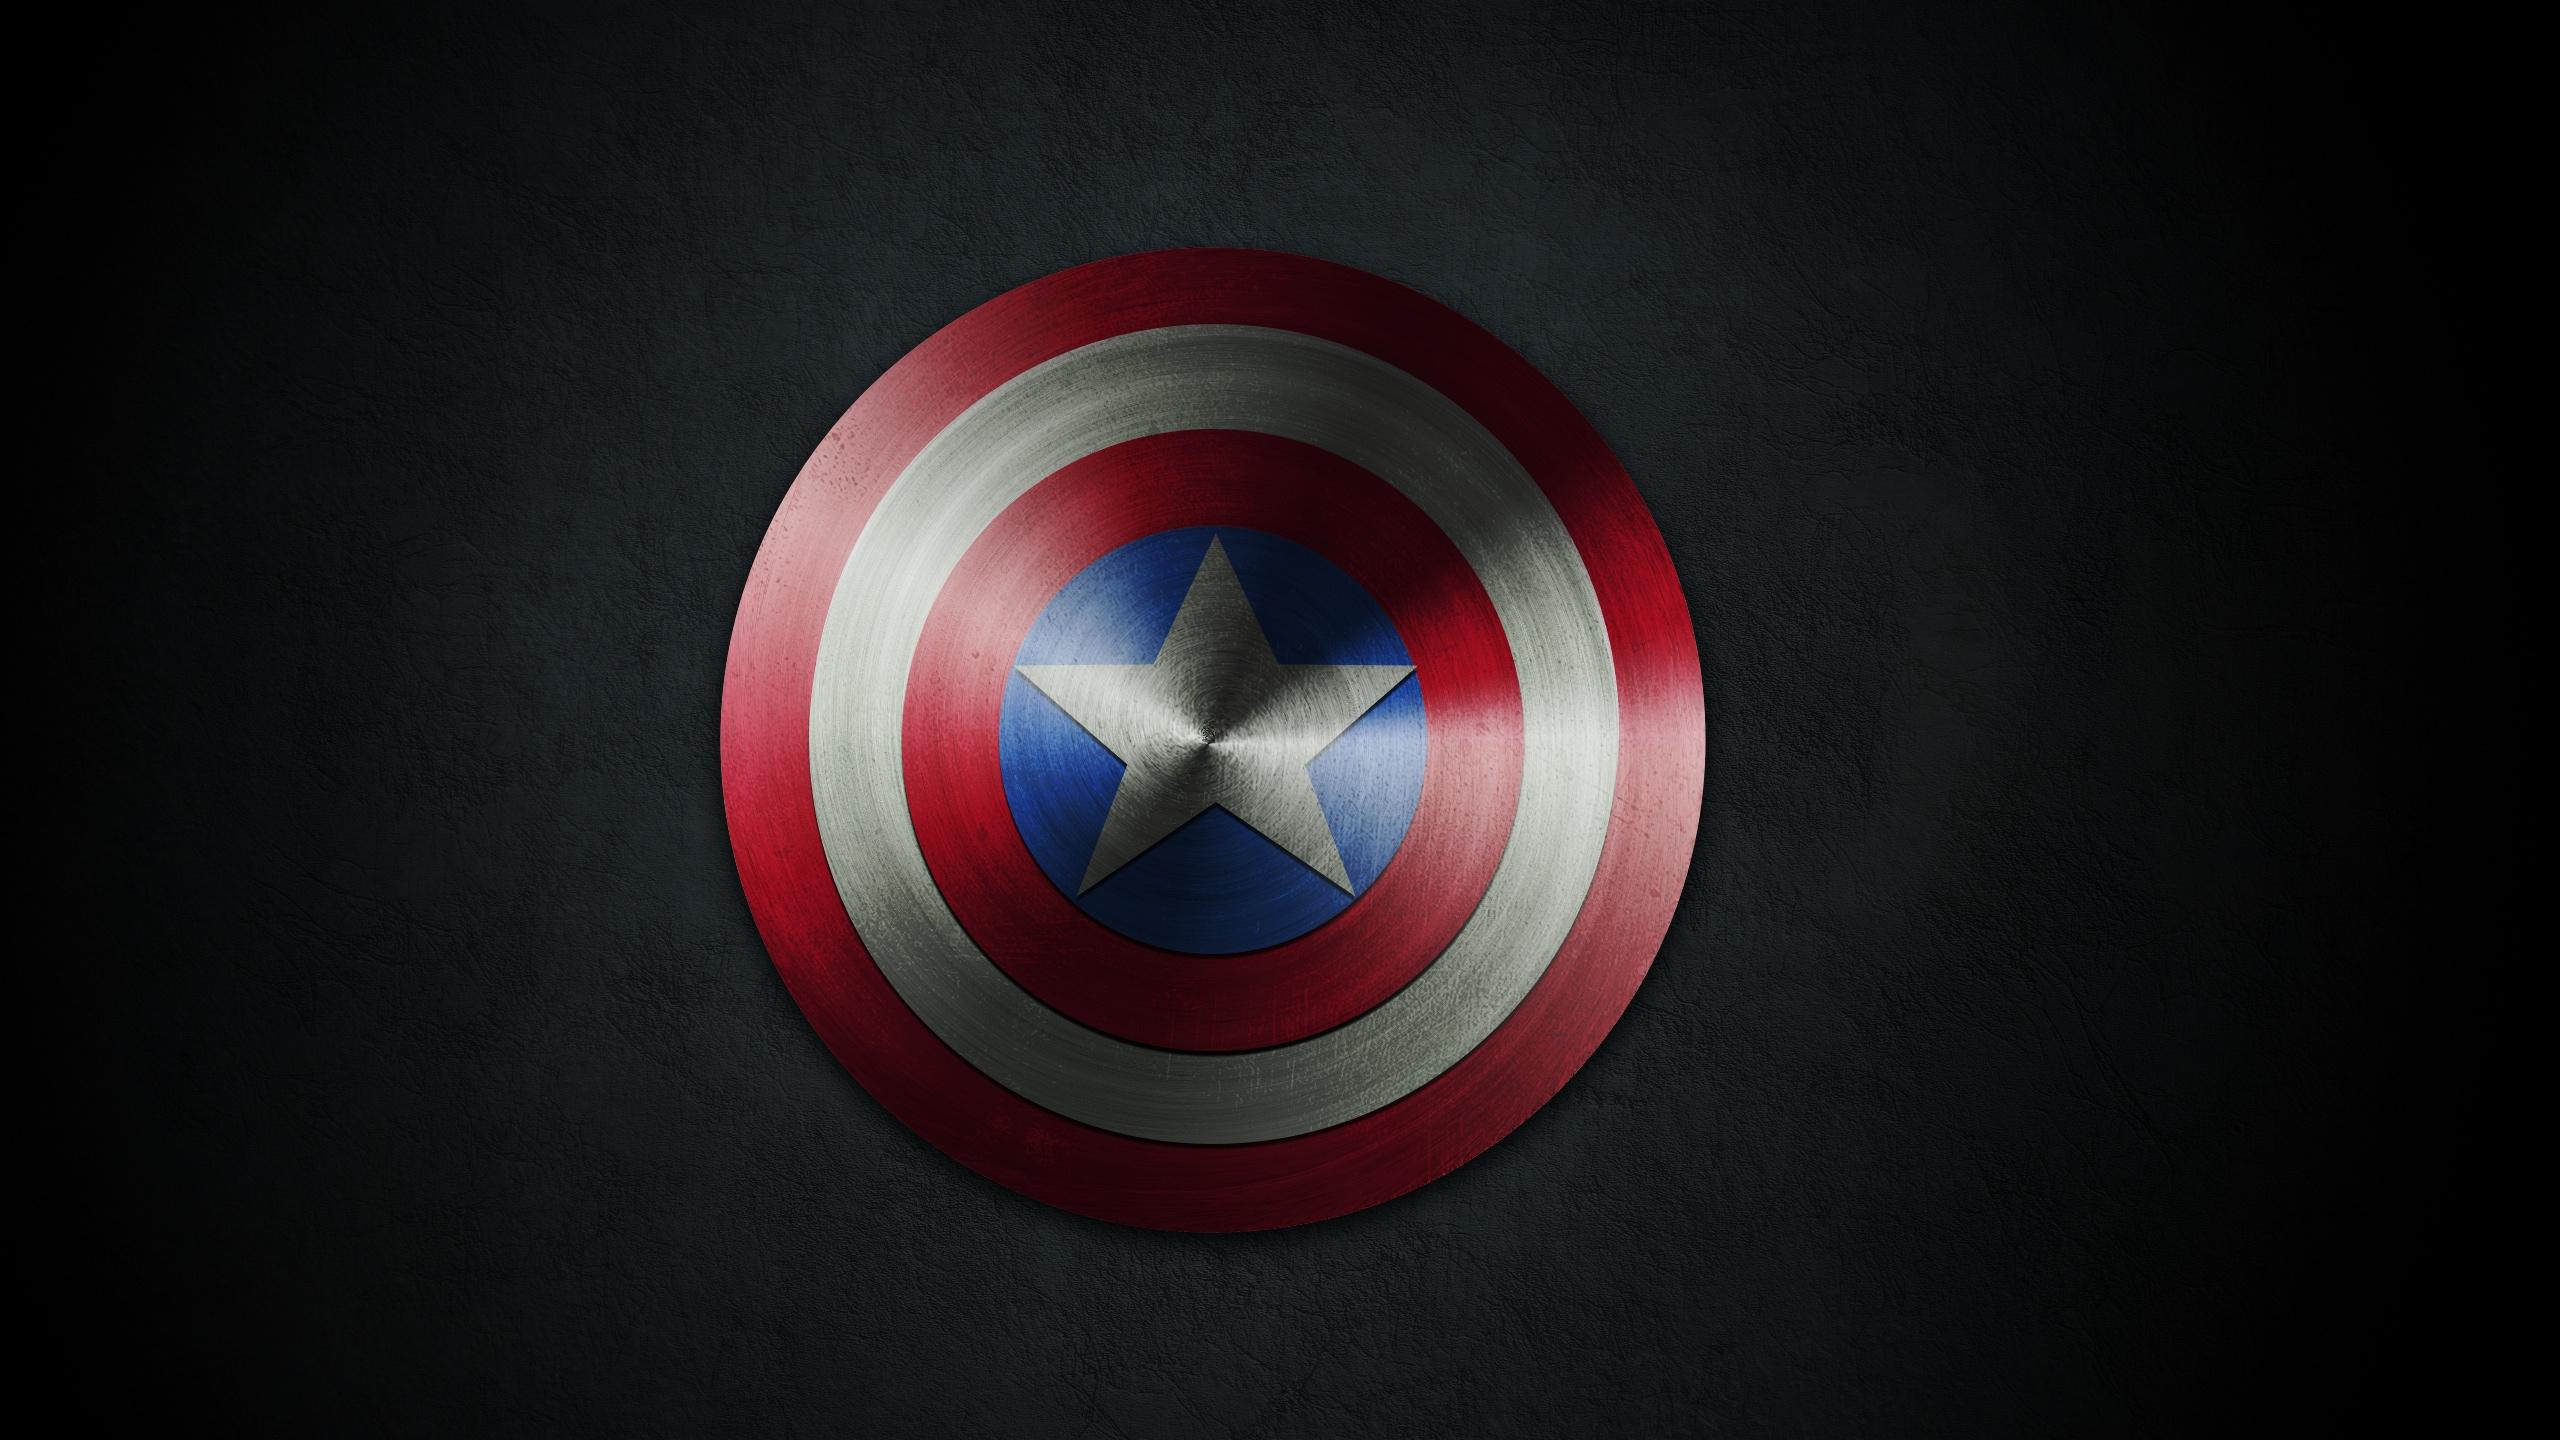 Captain America Shield 28 Hd Wallpaper   Trendy Wallpapers 2560x1440